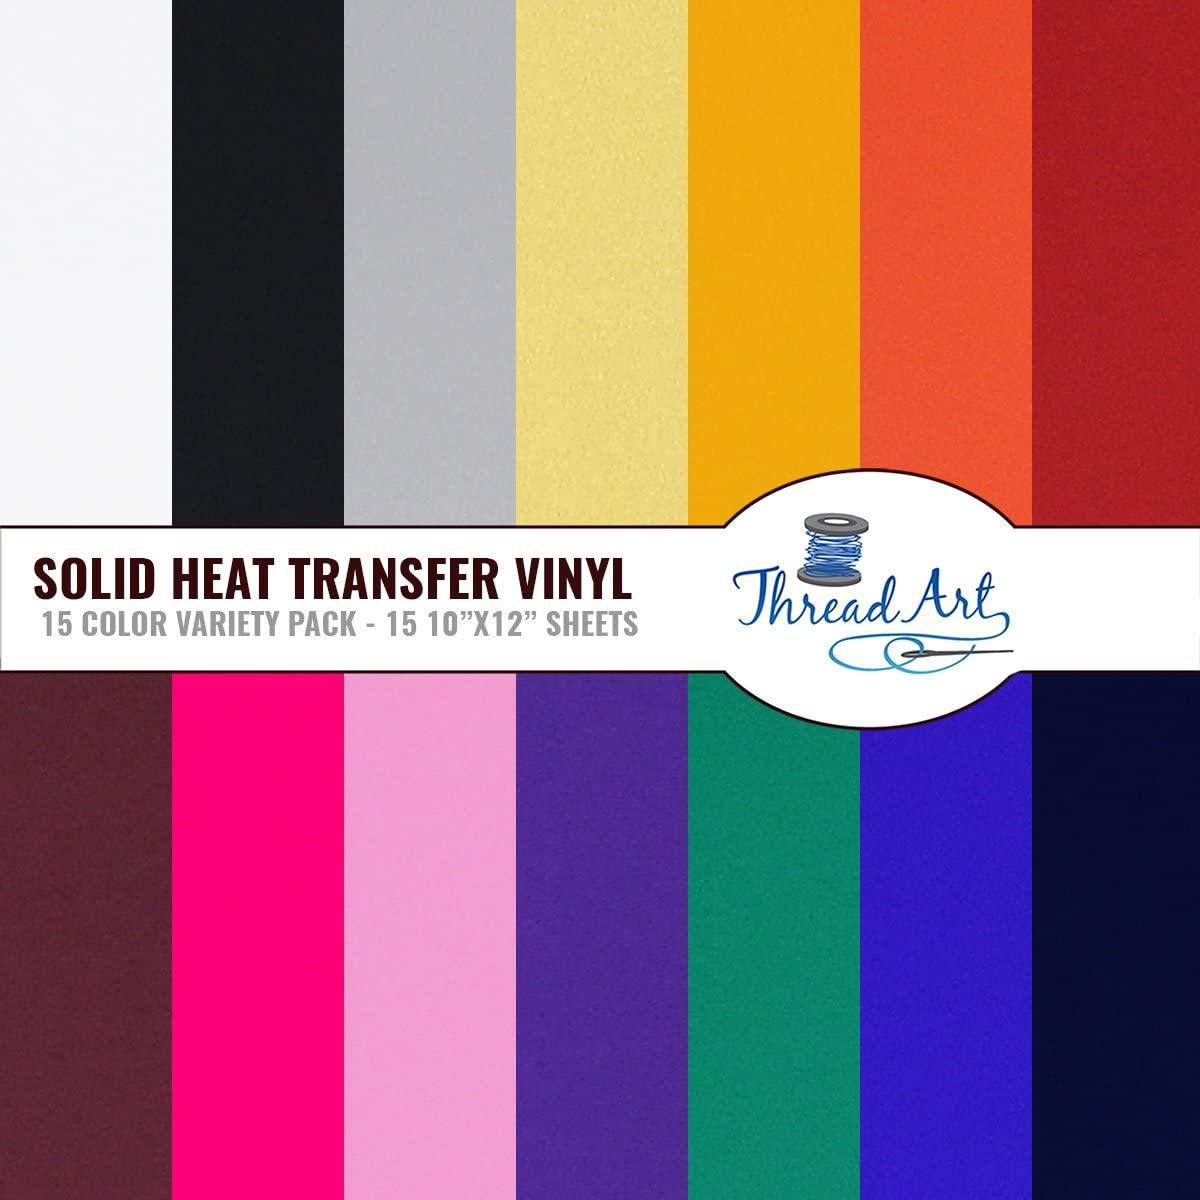 Threadart Variety Pack 10